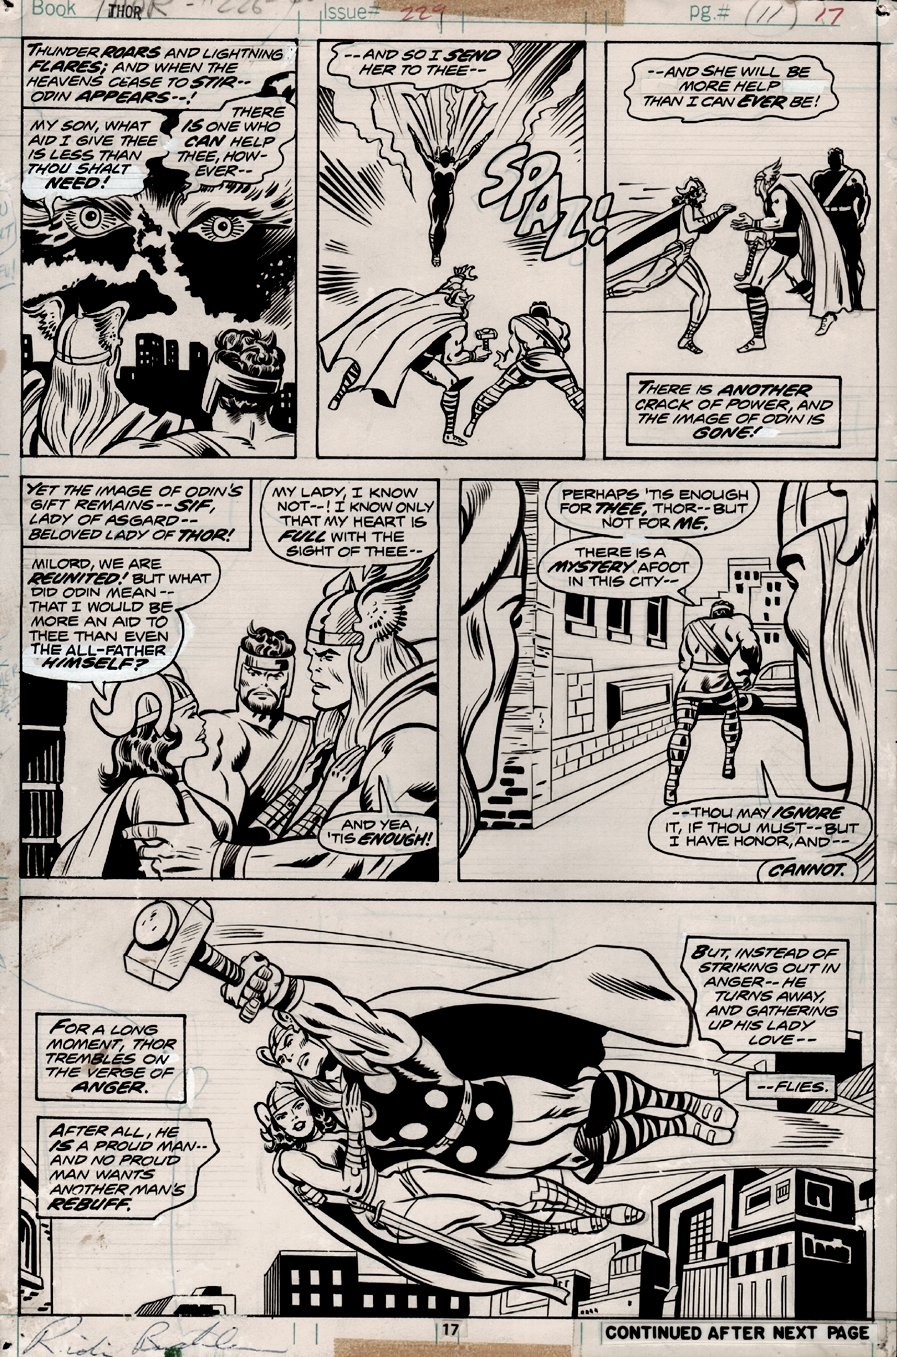 Thor #229 p 17 (1974)